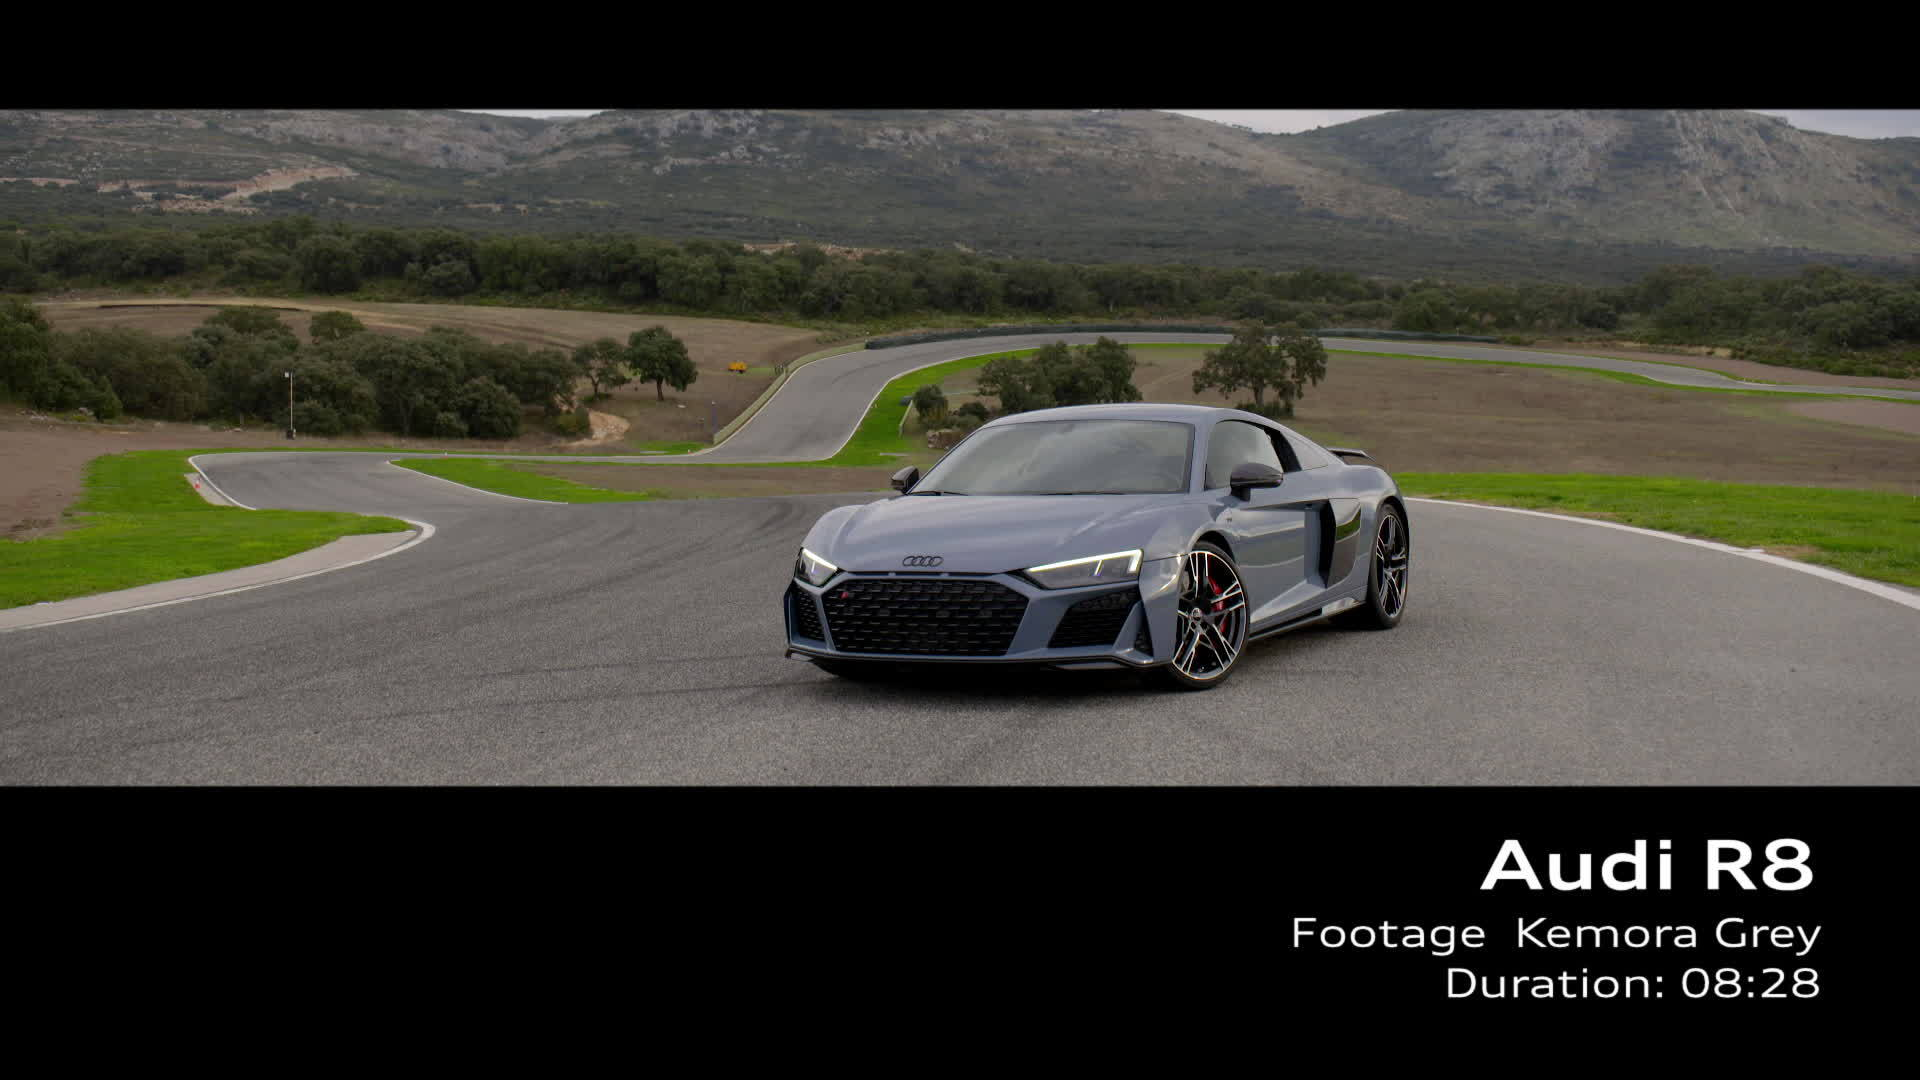 Audi R8 Footage Kemoragrau (2018)